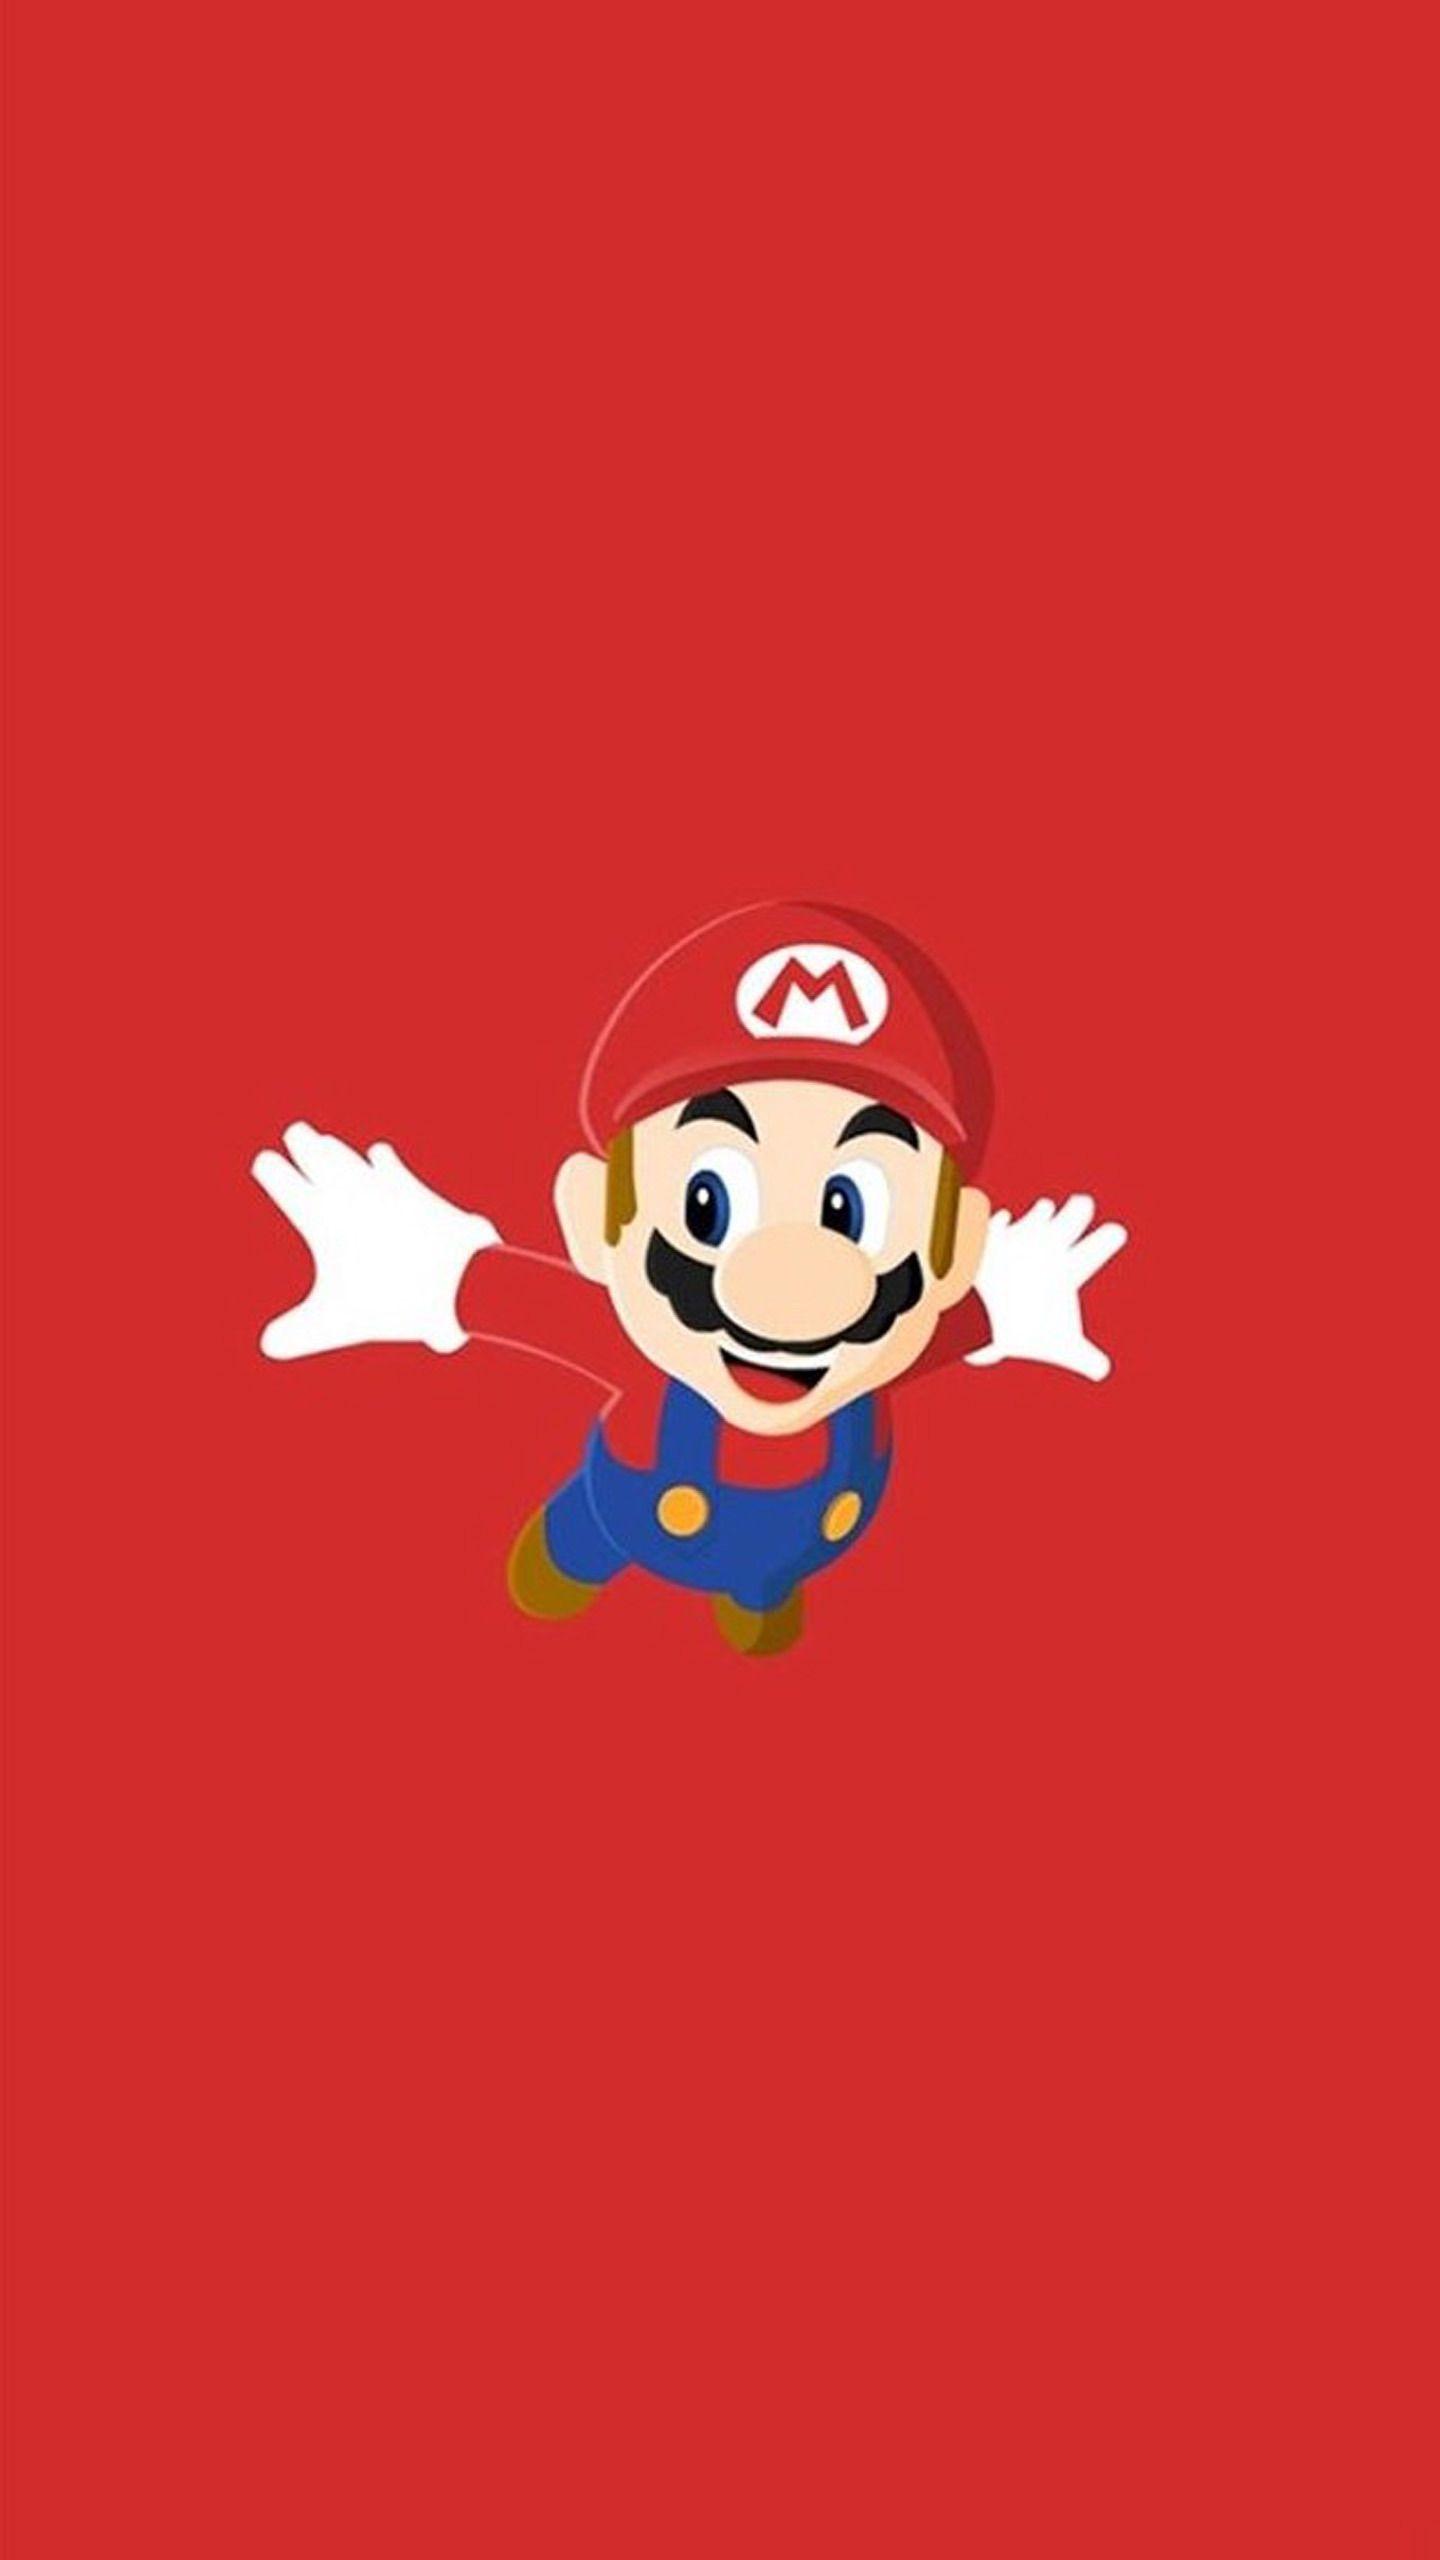 Pin By Wallpaper On Mariowallpaper3 Super Mario Mario Cartoon